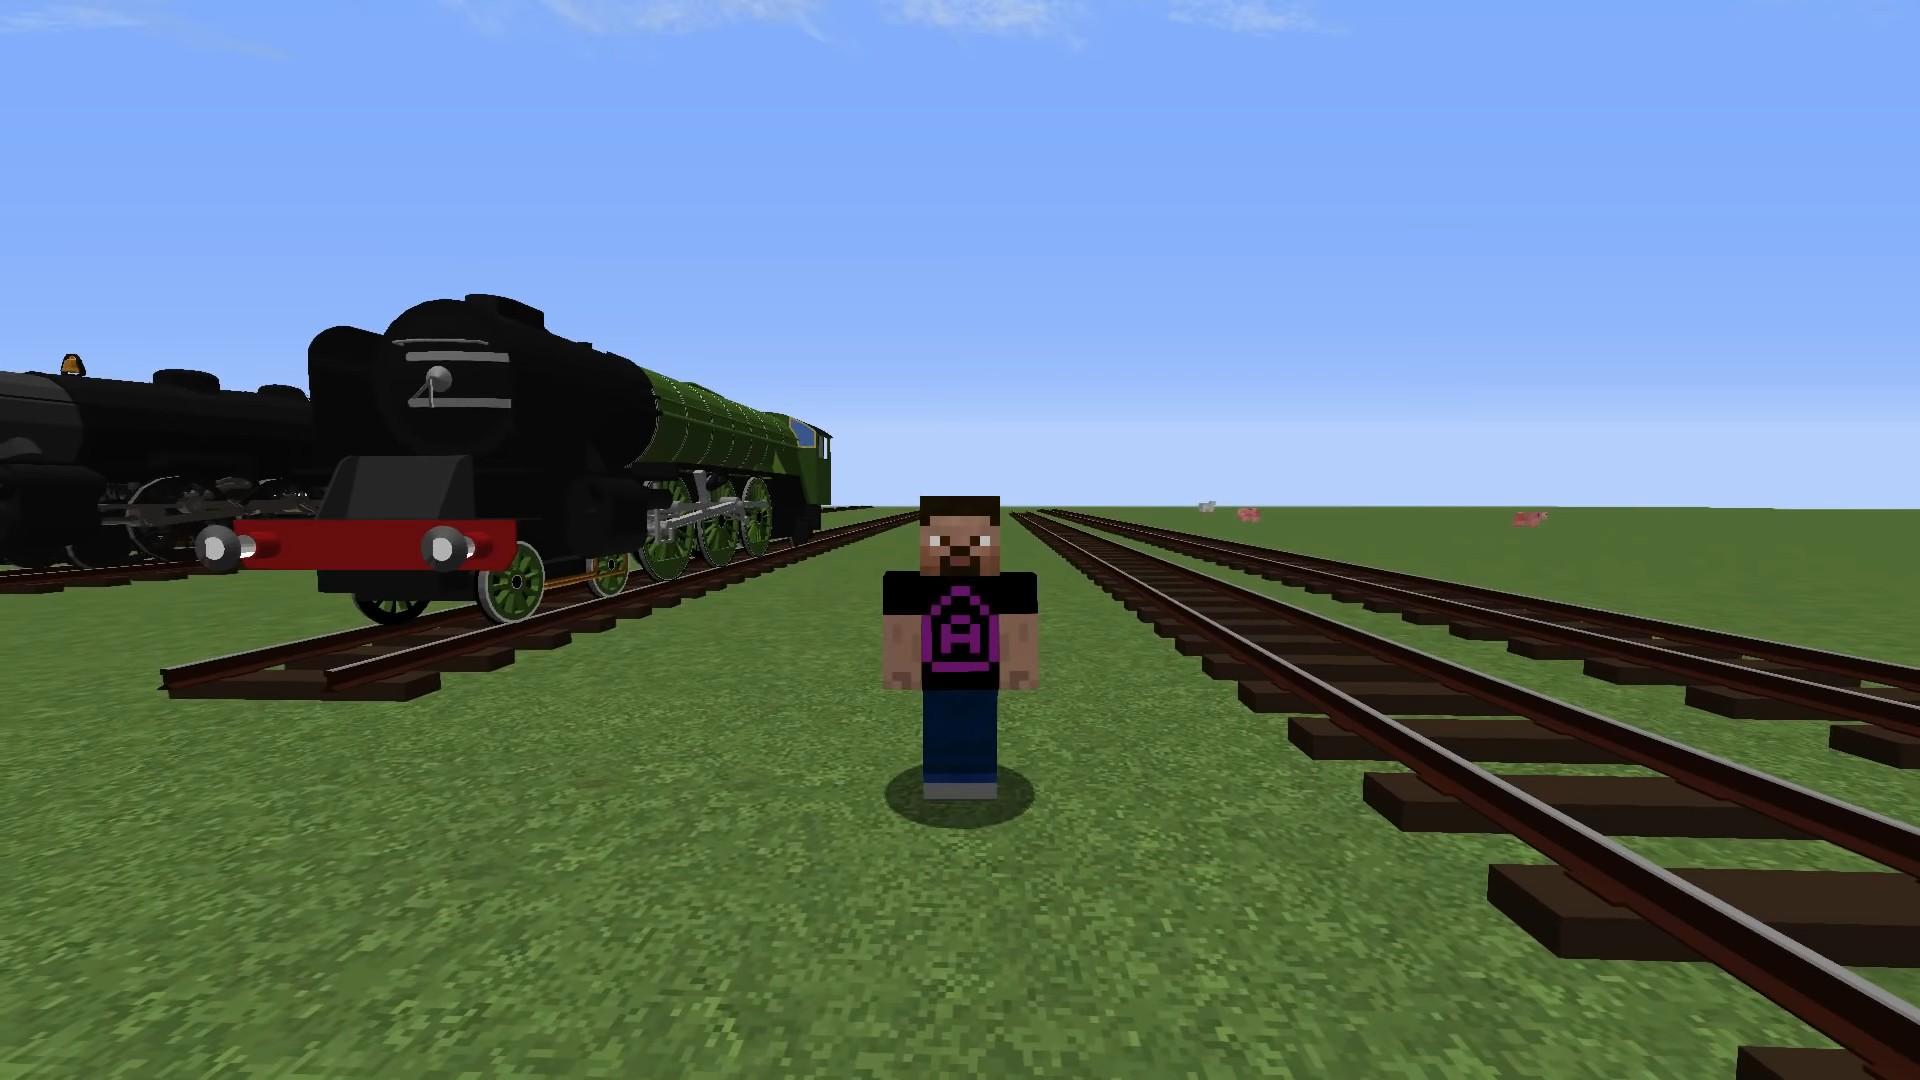 Мод Immersive Railroading - скриншот 1